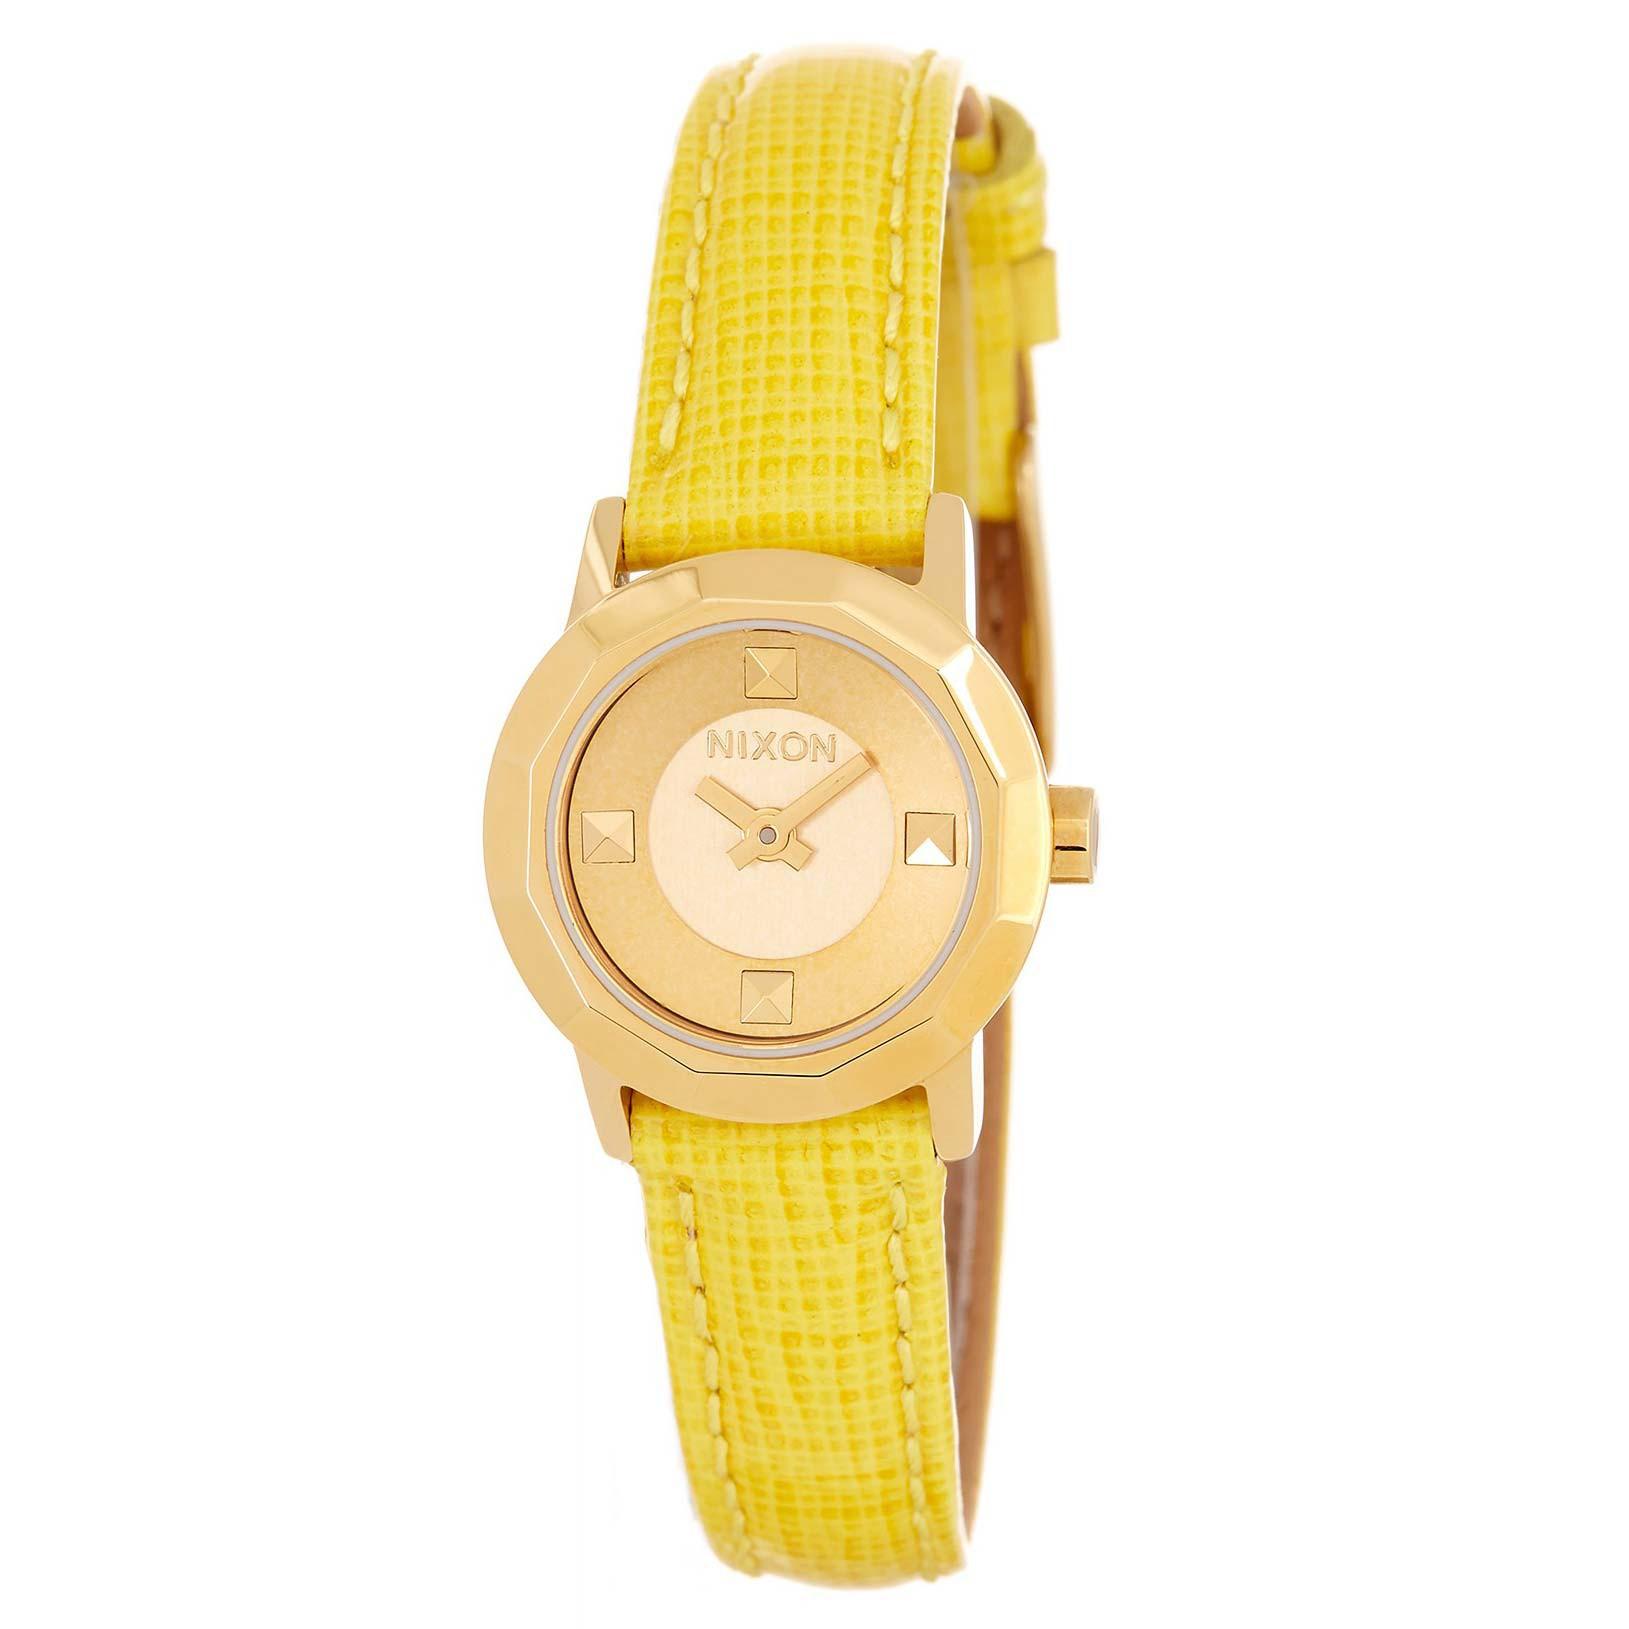 Hodinky Nixon Mini B gold/yellow